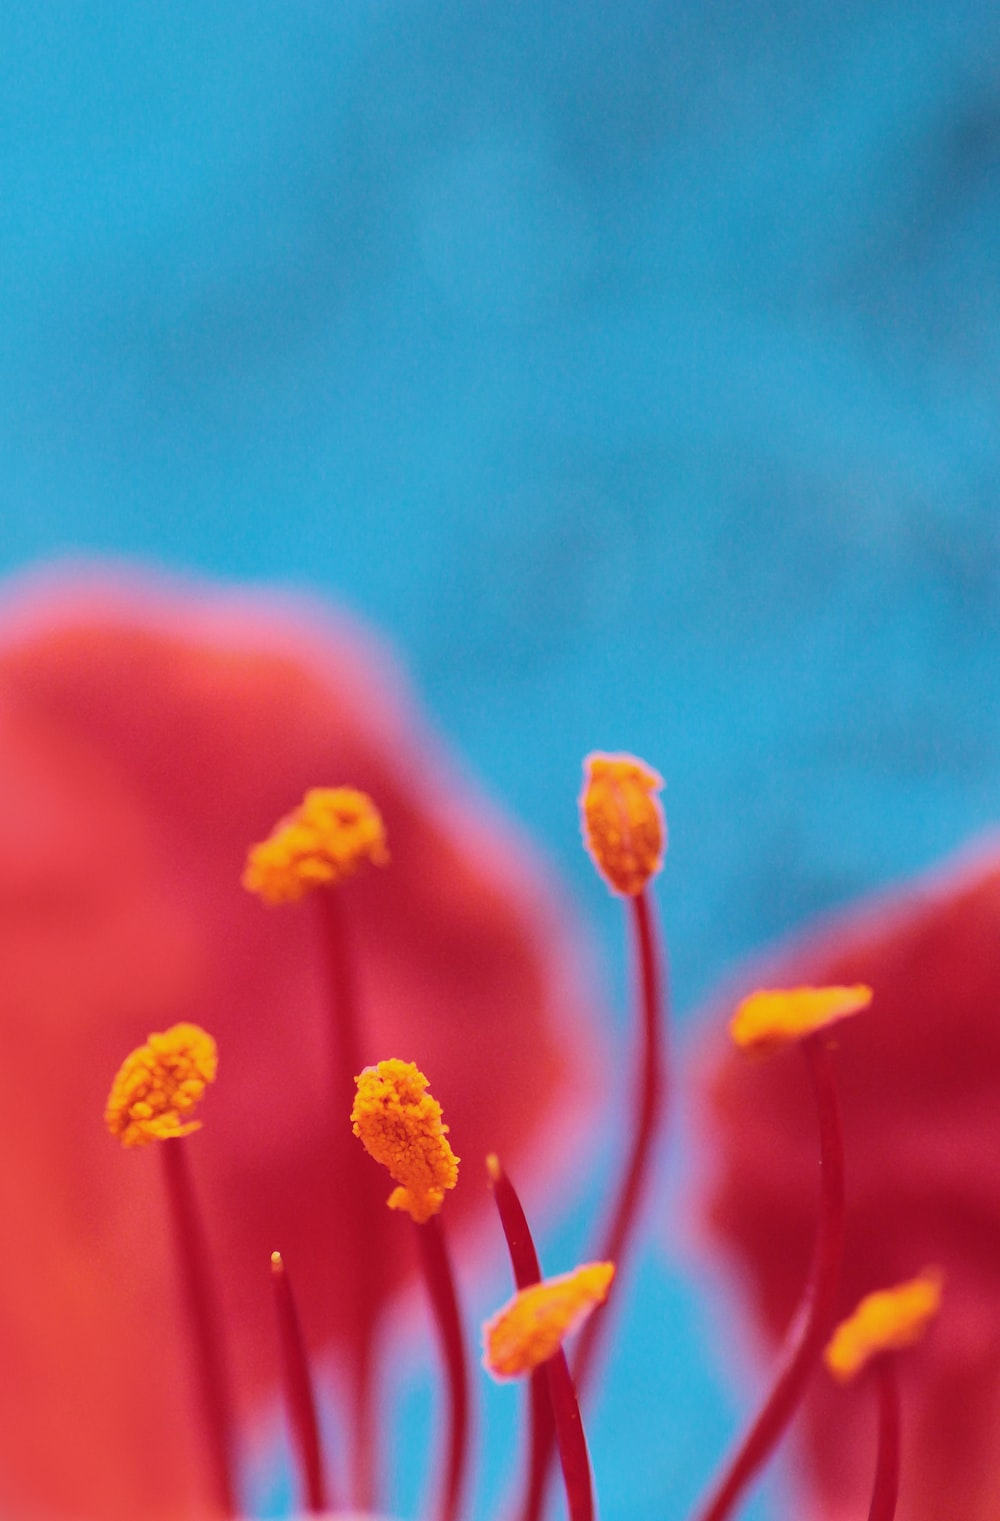 selective focus photography of orange flowers